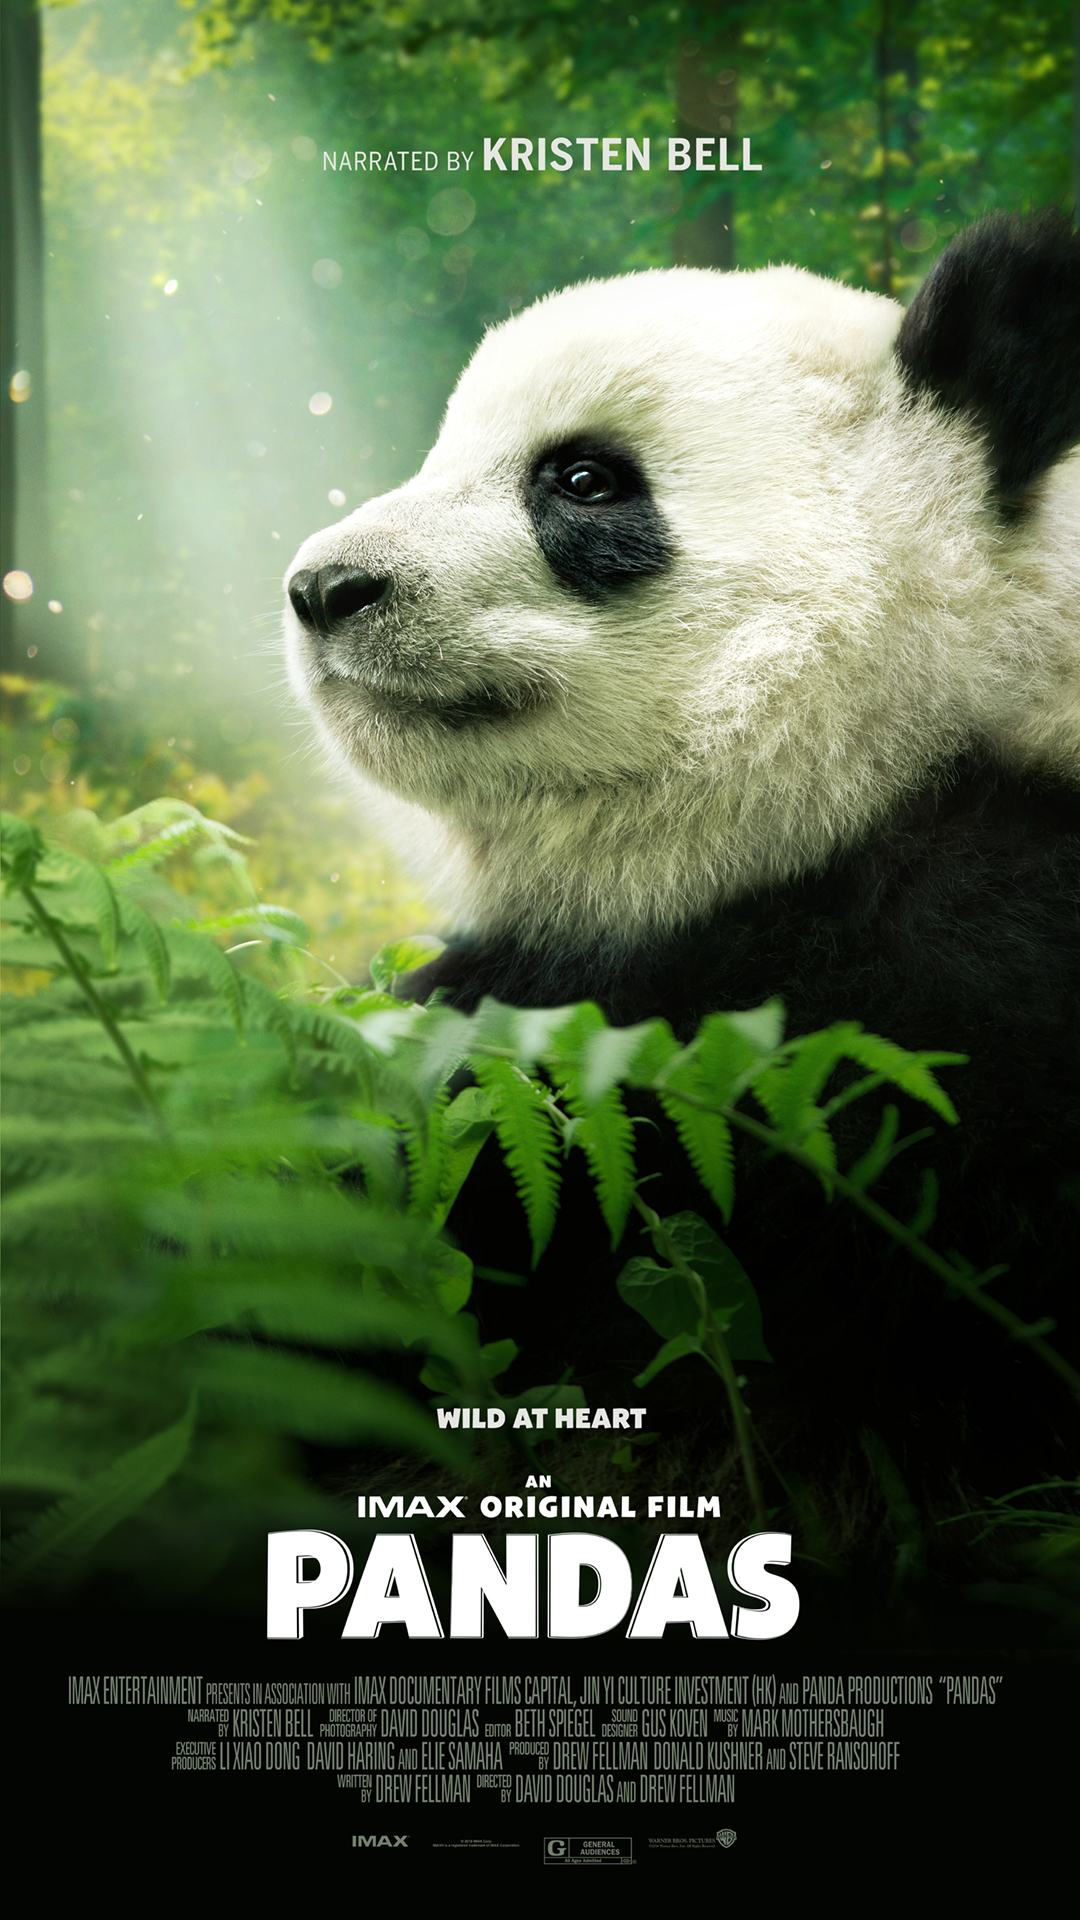 PANDAS coming to IMAX 8/17